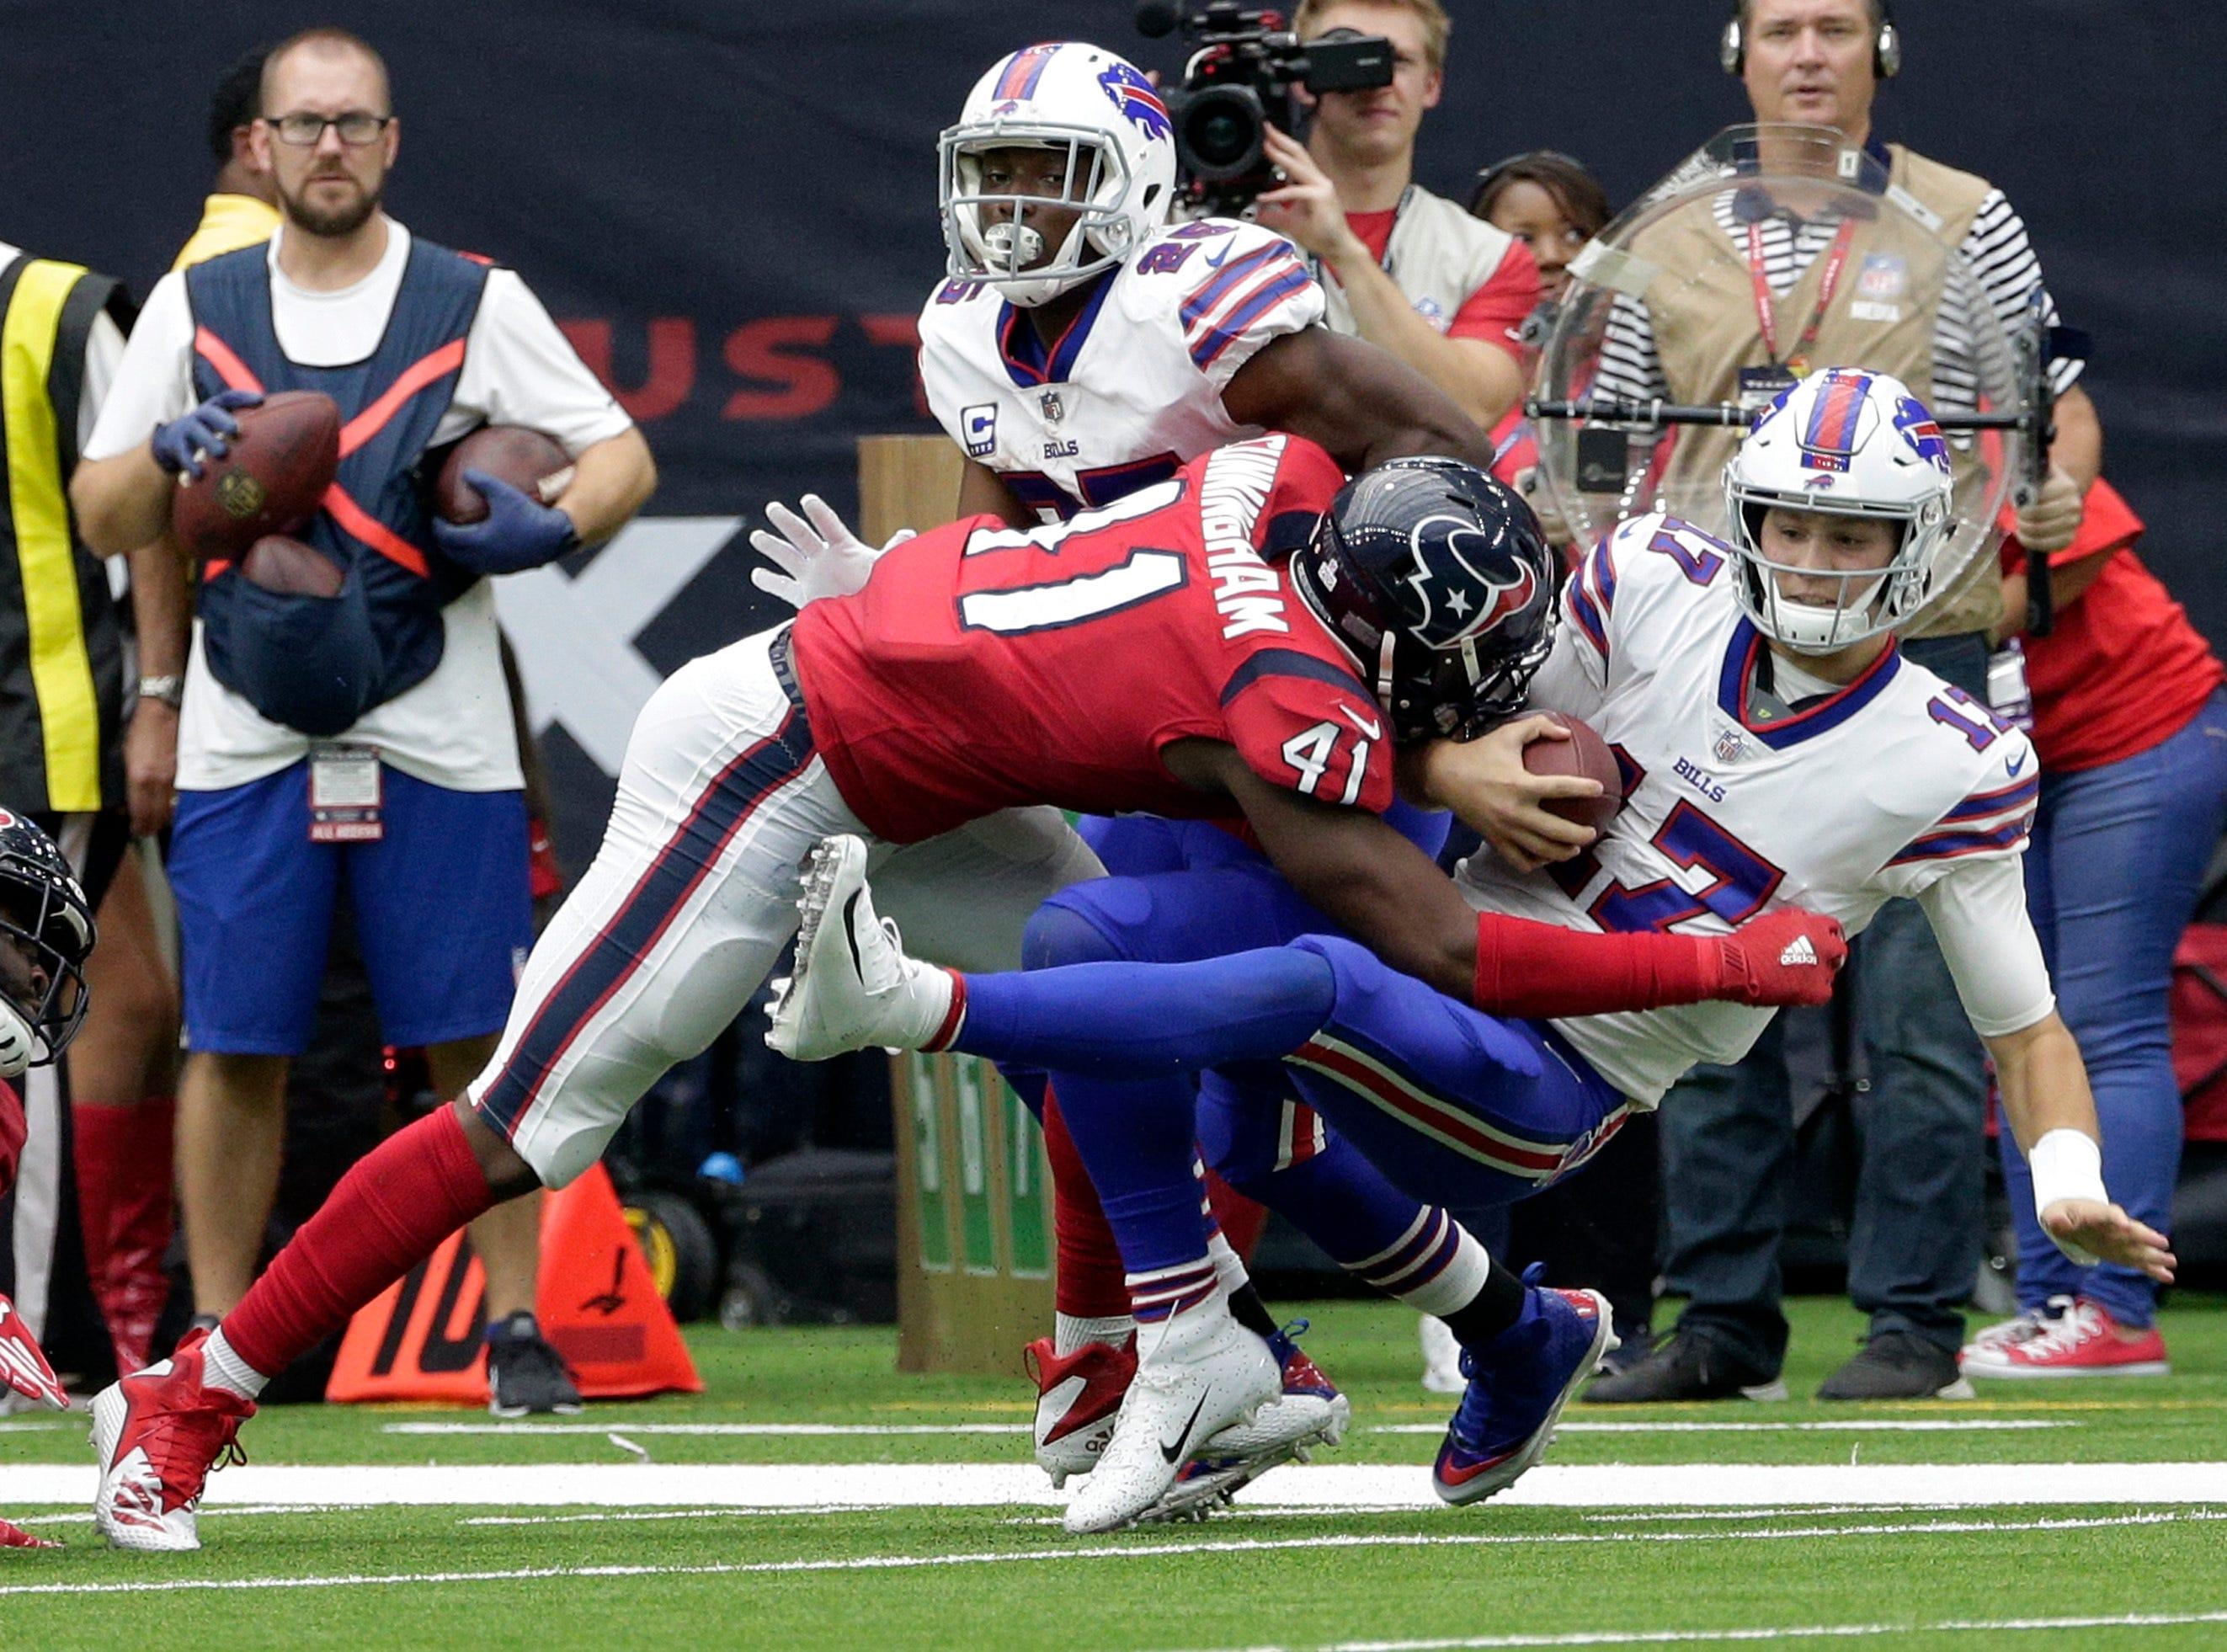 Buffalo Bills quarterback Josh Allen (17) is hit by Houston Texans linebacker Zach Cunningham (41) during the second half of an NFL football game, Sunday, Oct. 14, 2018, in Houston. (AP Photo/Michael Wyke)